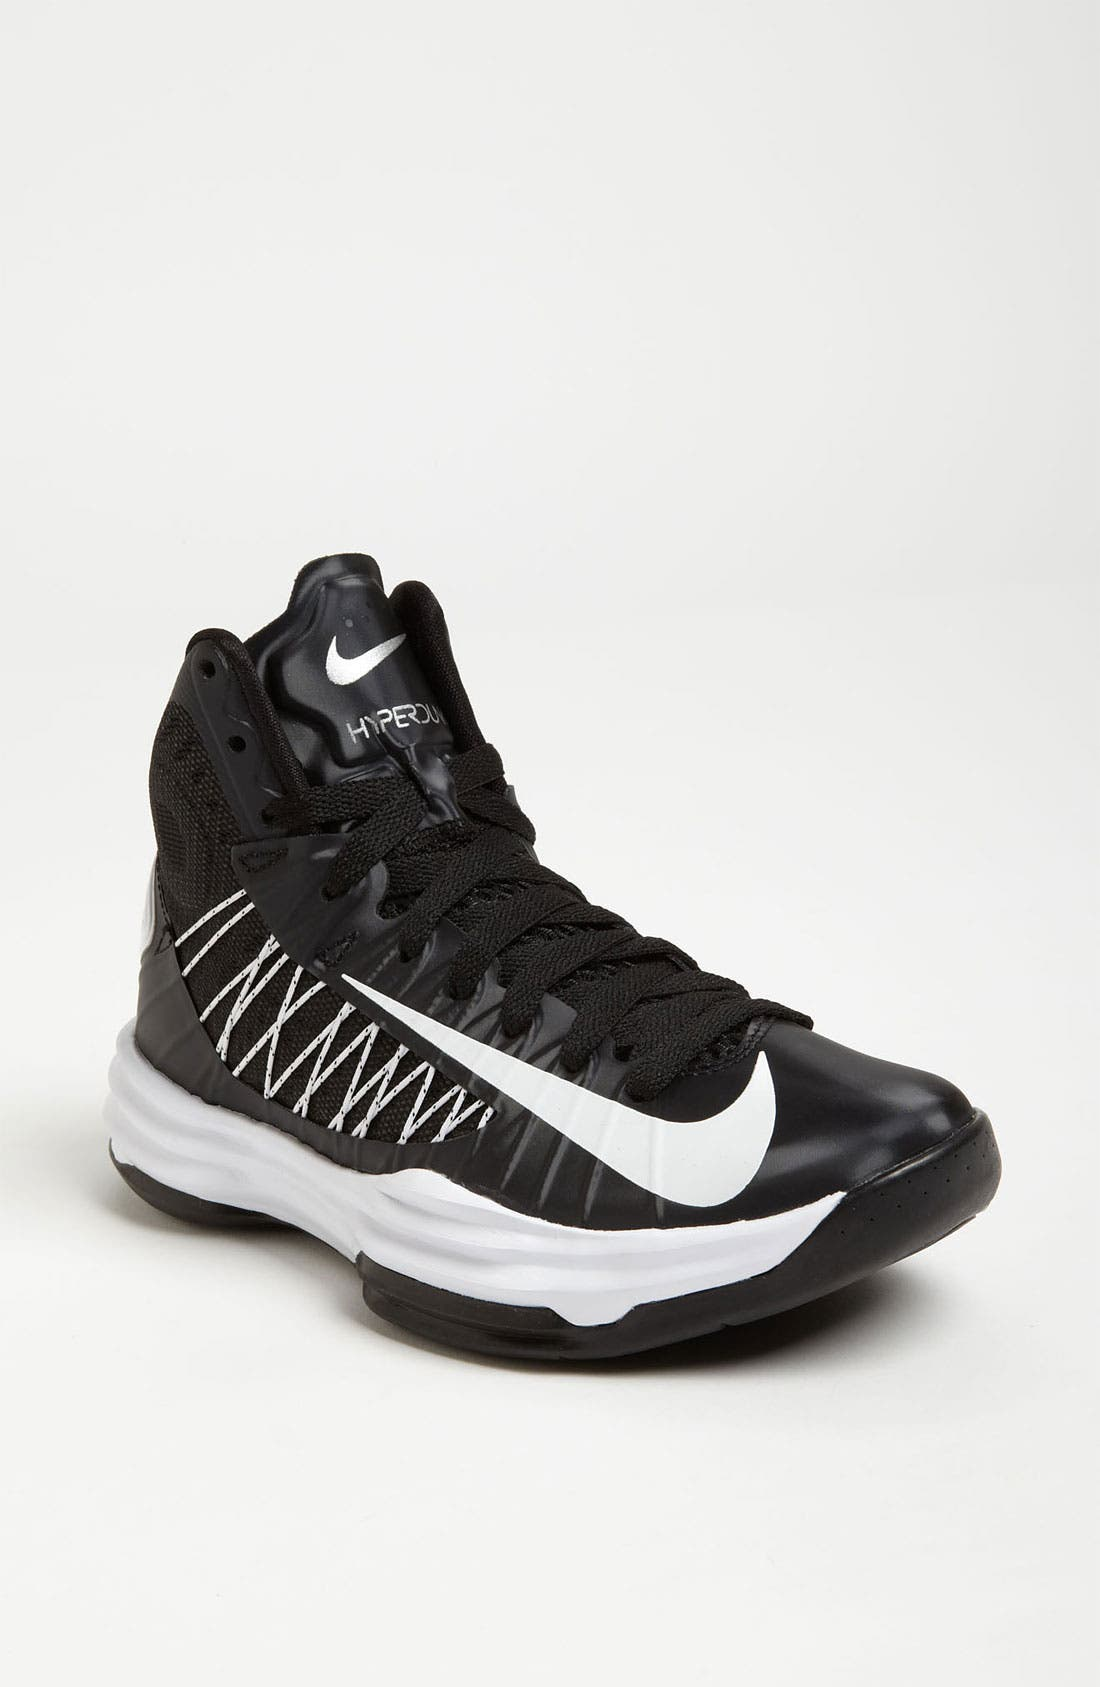 Main Image - Nike 'Lunar Hyperdunk' Basketball Shoe (Women)